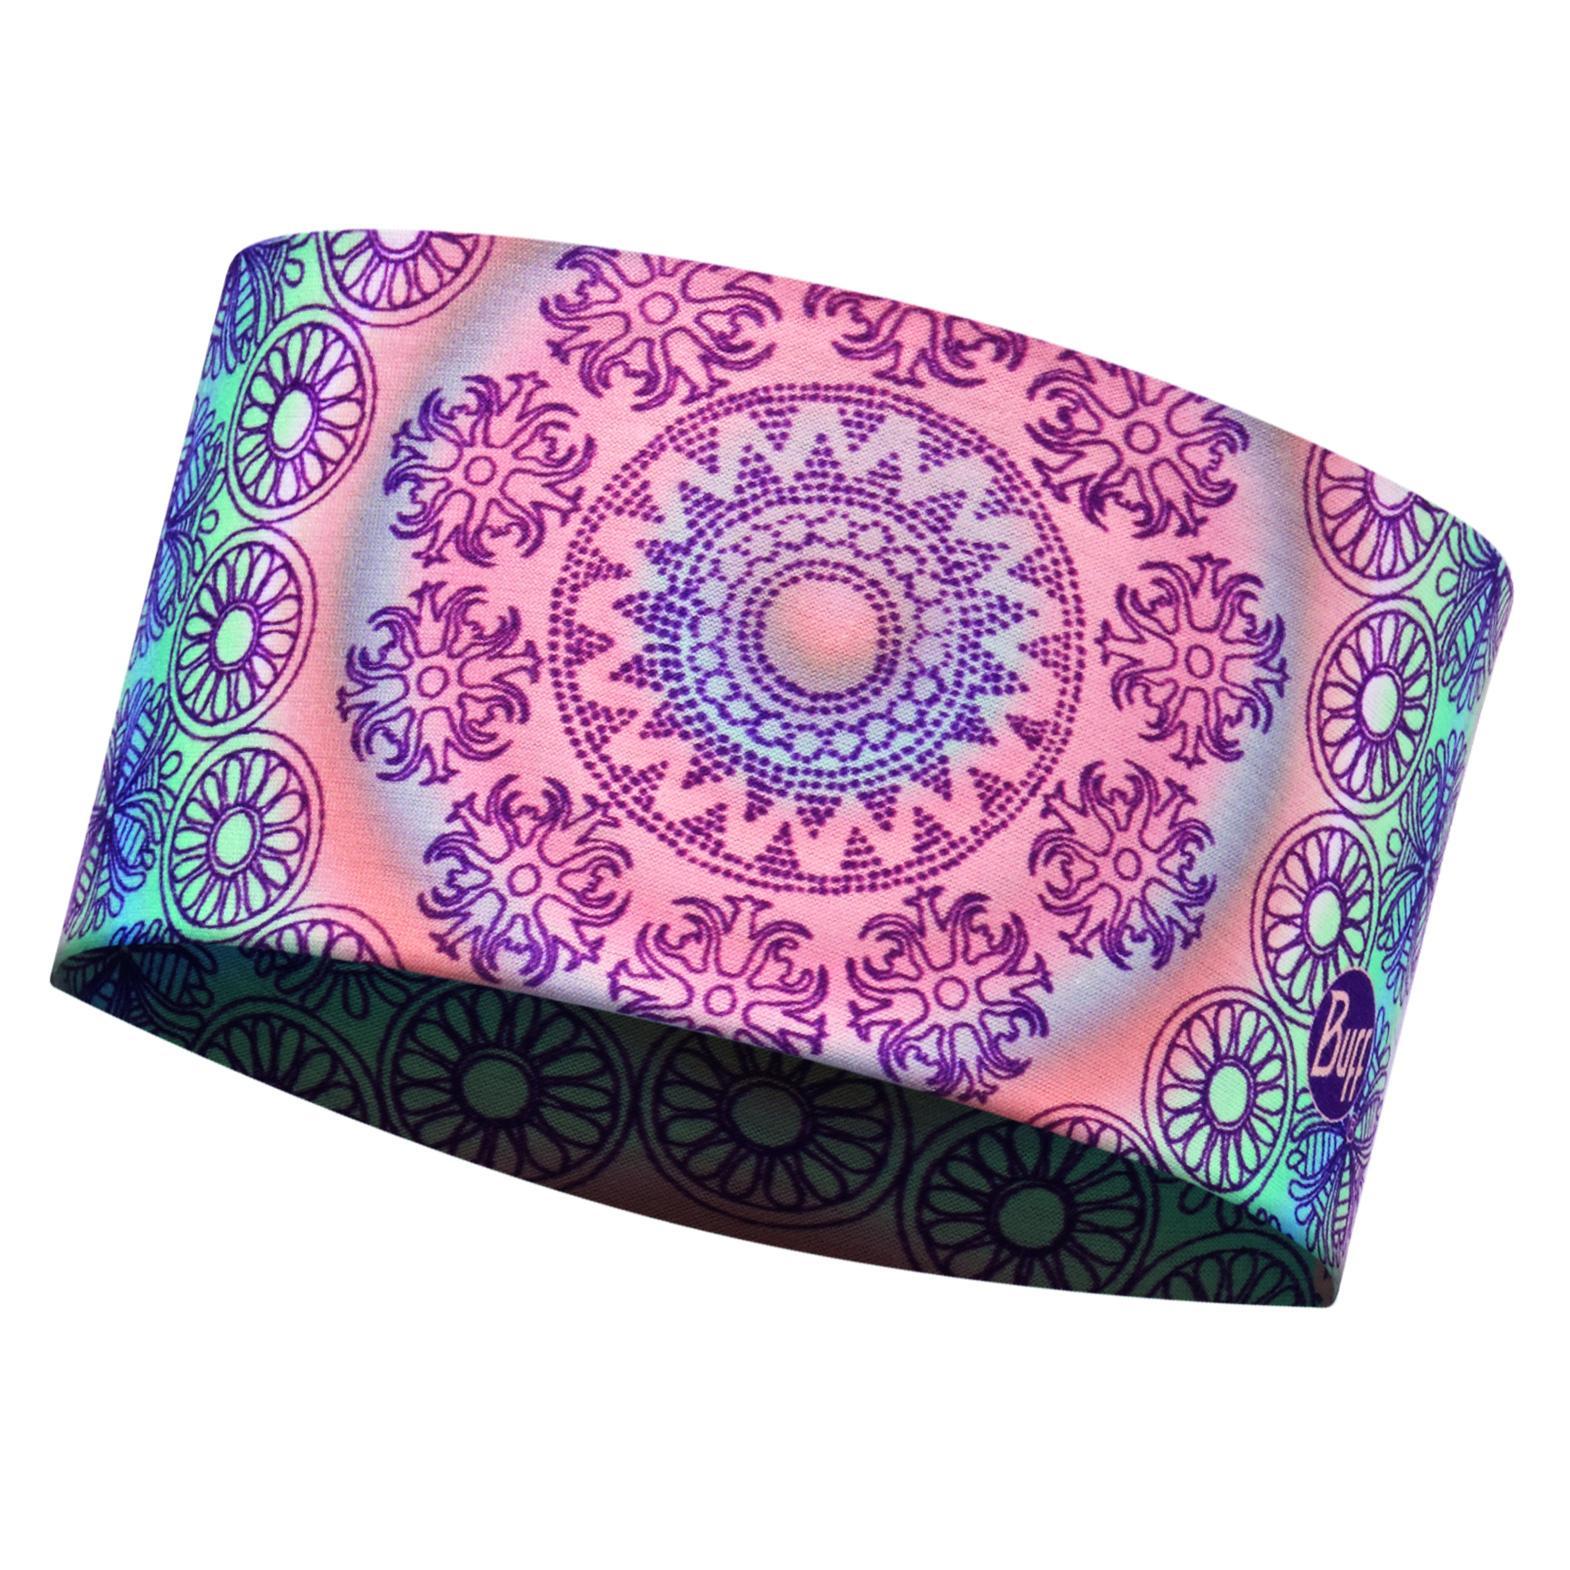 Купить Повязка BUFF Headband SHANTRA VIOLET Банданы и шарфы Buff ® 1312844